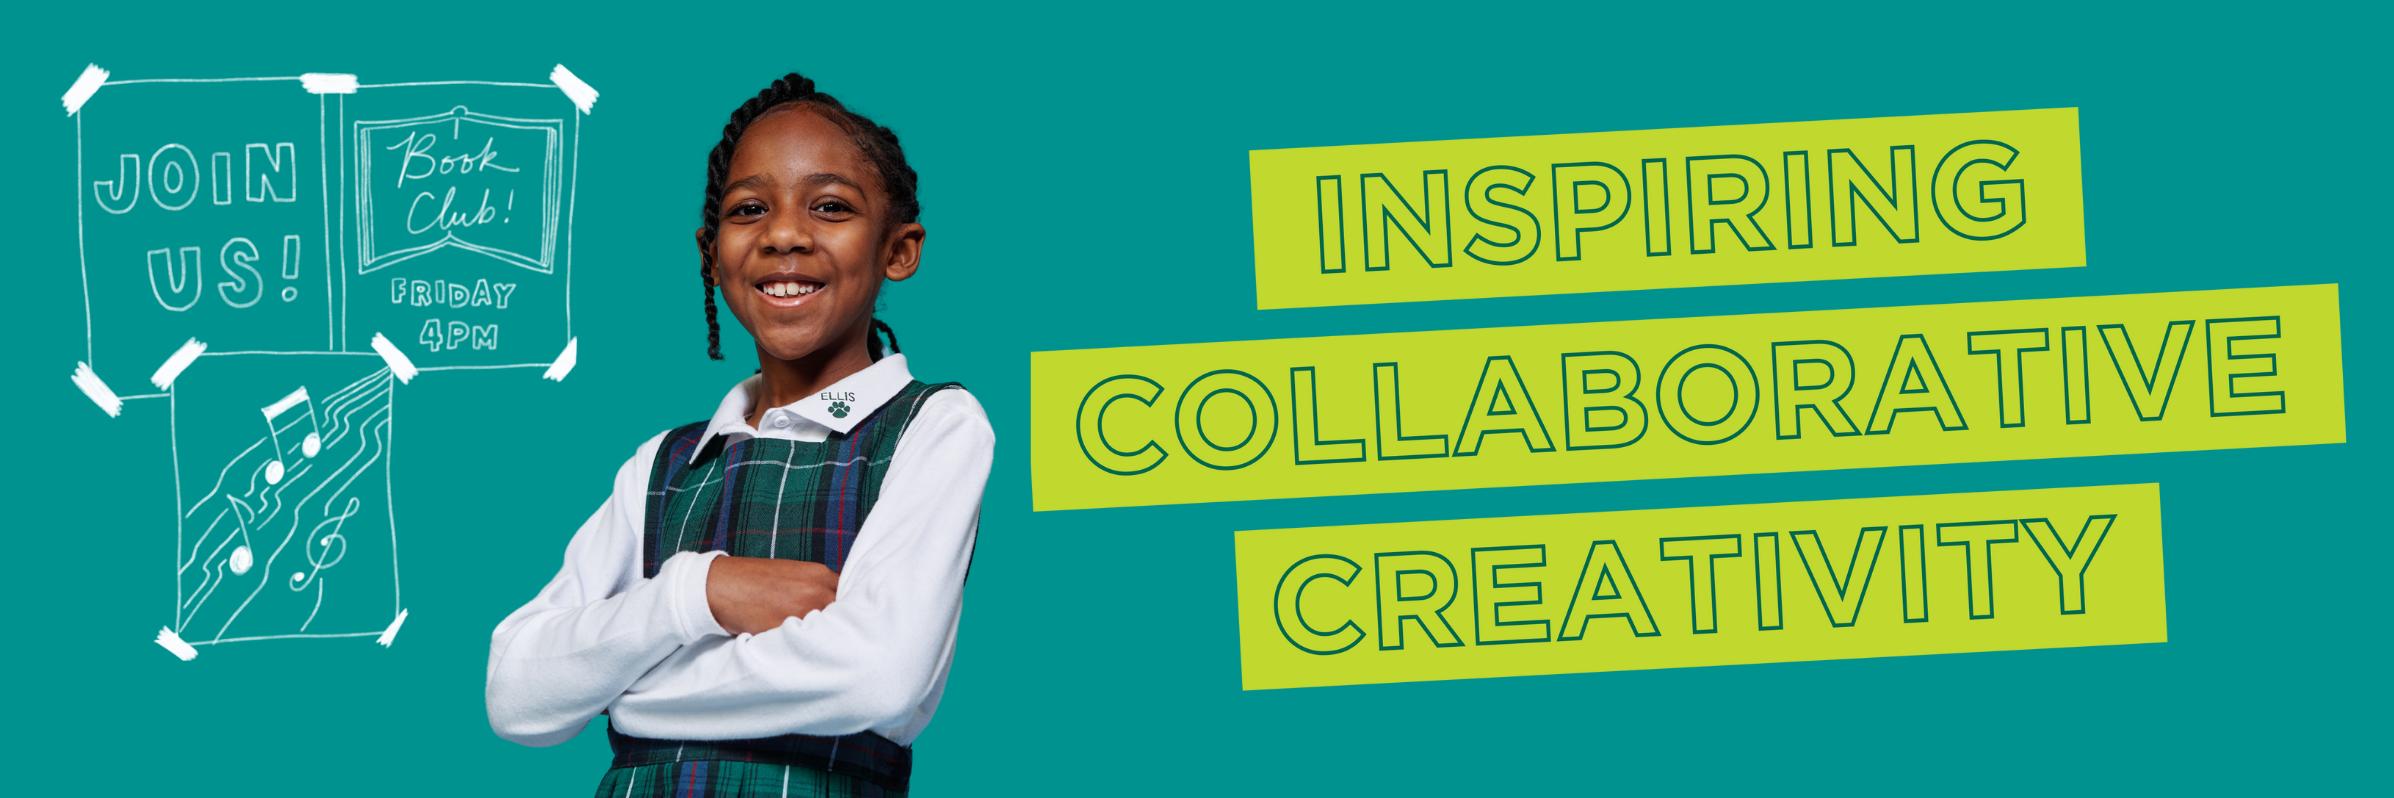 Inspiring Collaborative Creativity